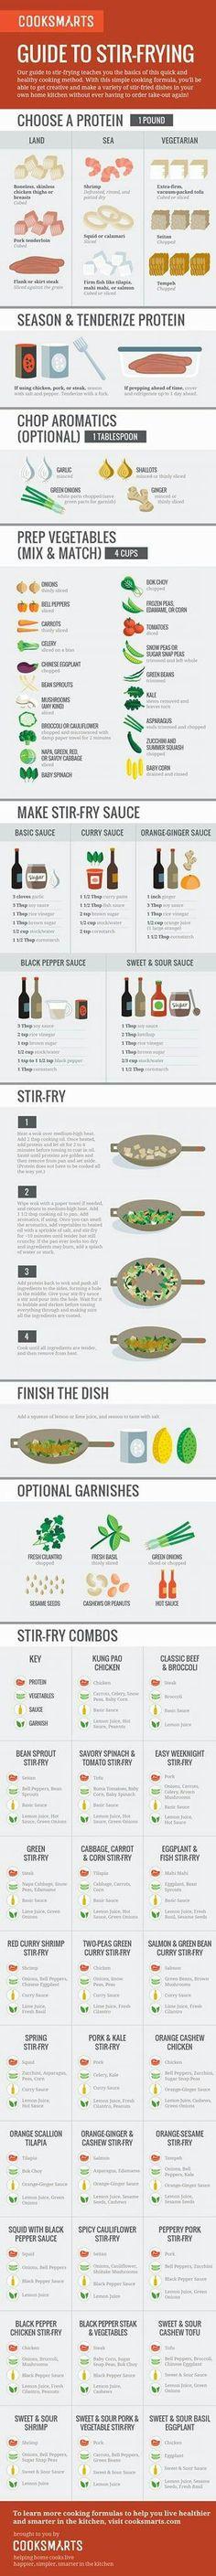 Stir-Fry helps!!